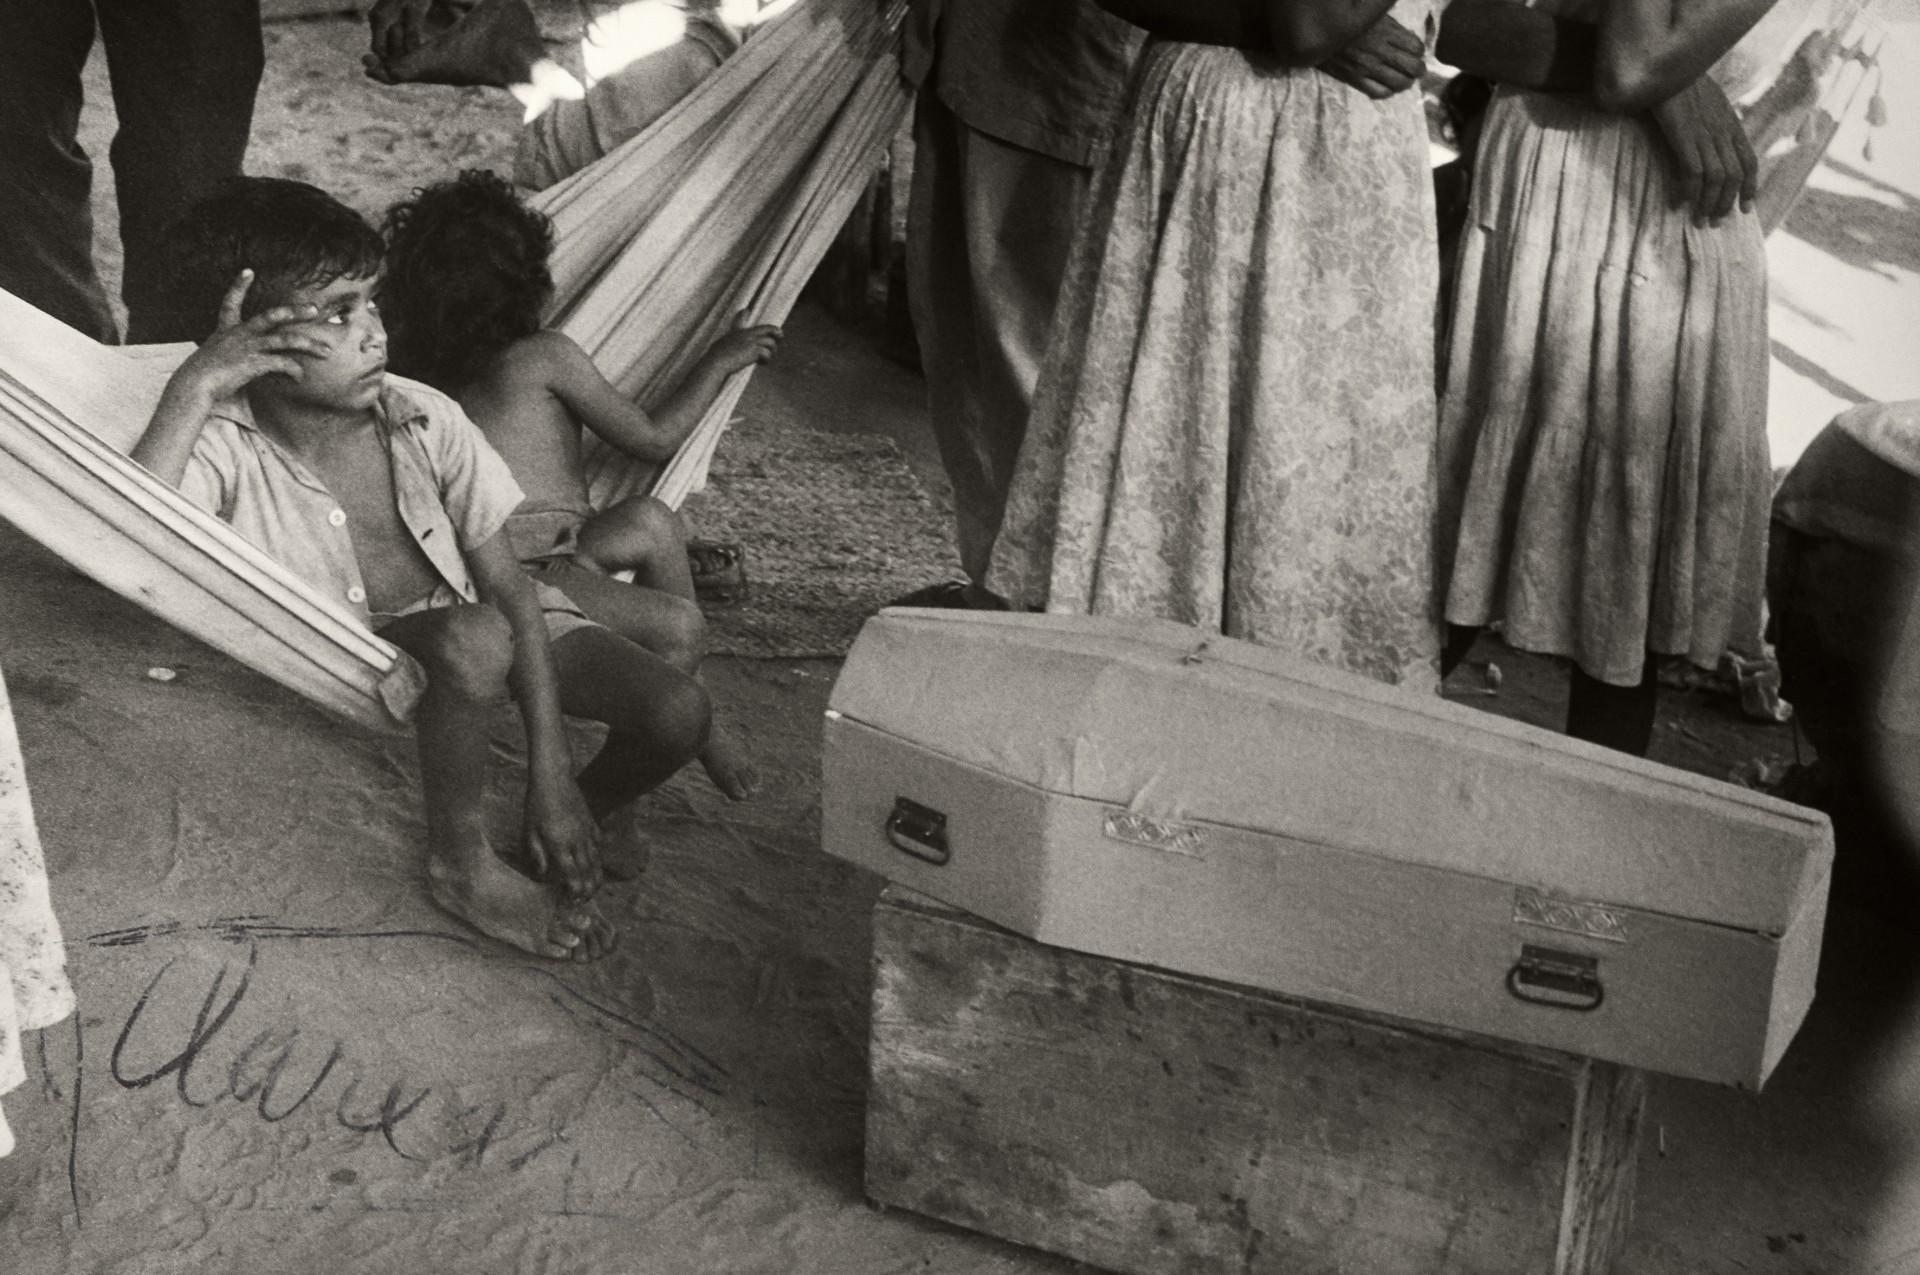 A Vmortalidade infantil e o flagelo da seca. Ceará, 1958